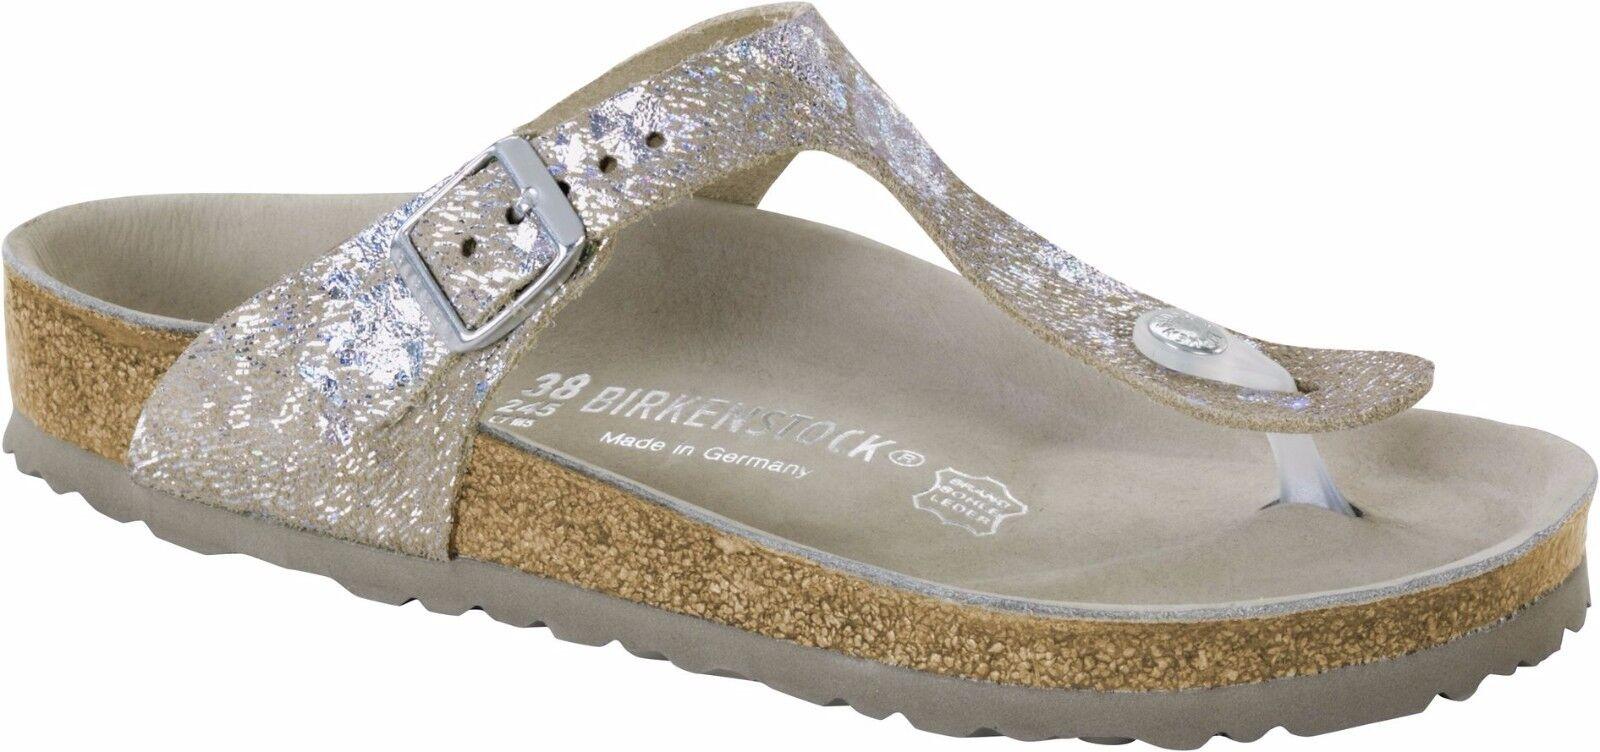 Birkenstock Exquisit Gizeh Spotted Metallic normal Silver Größe 35-43 Fußbett normal Metallic 83b6cf